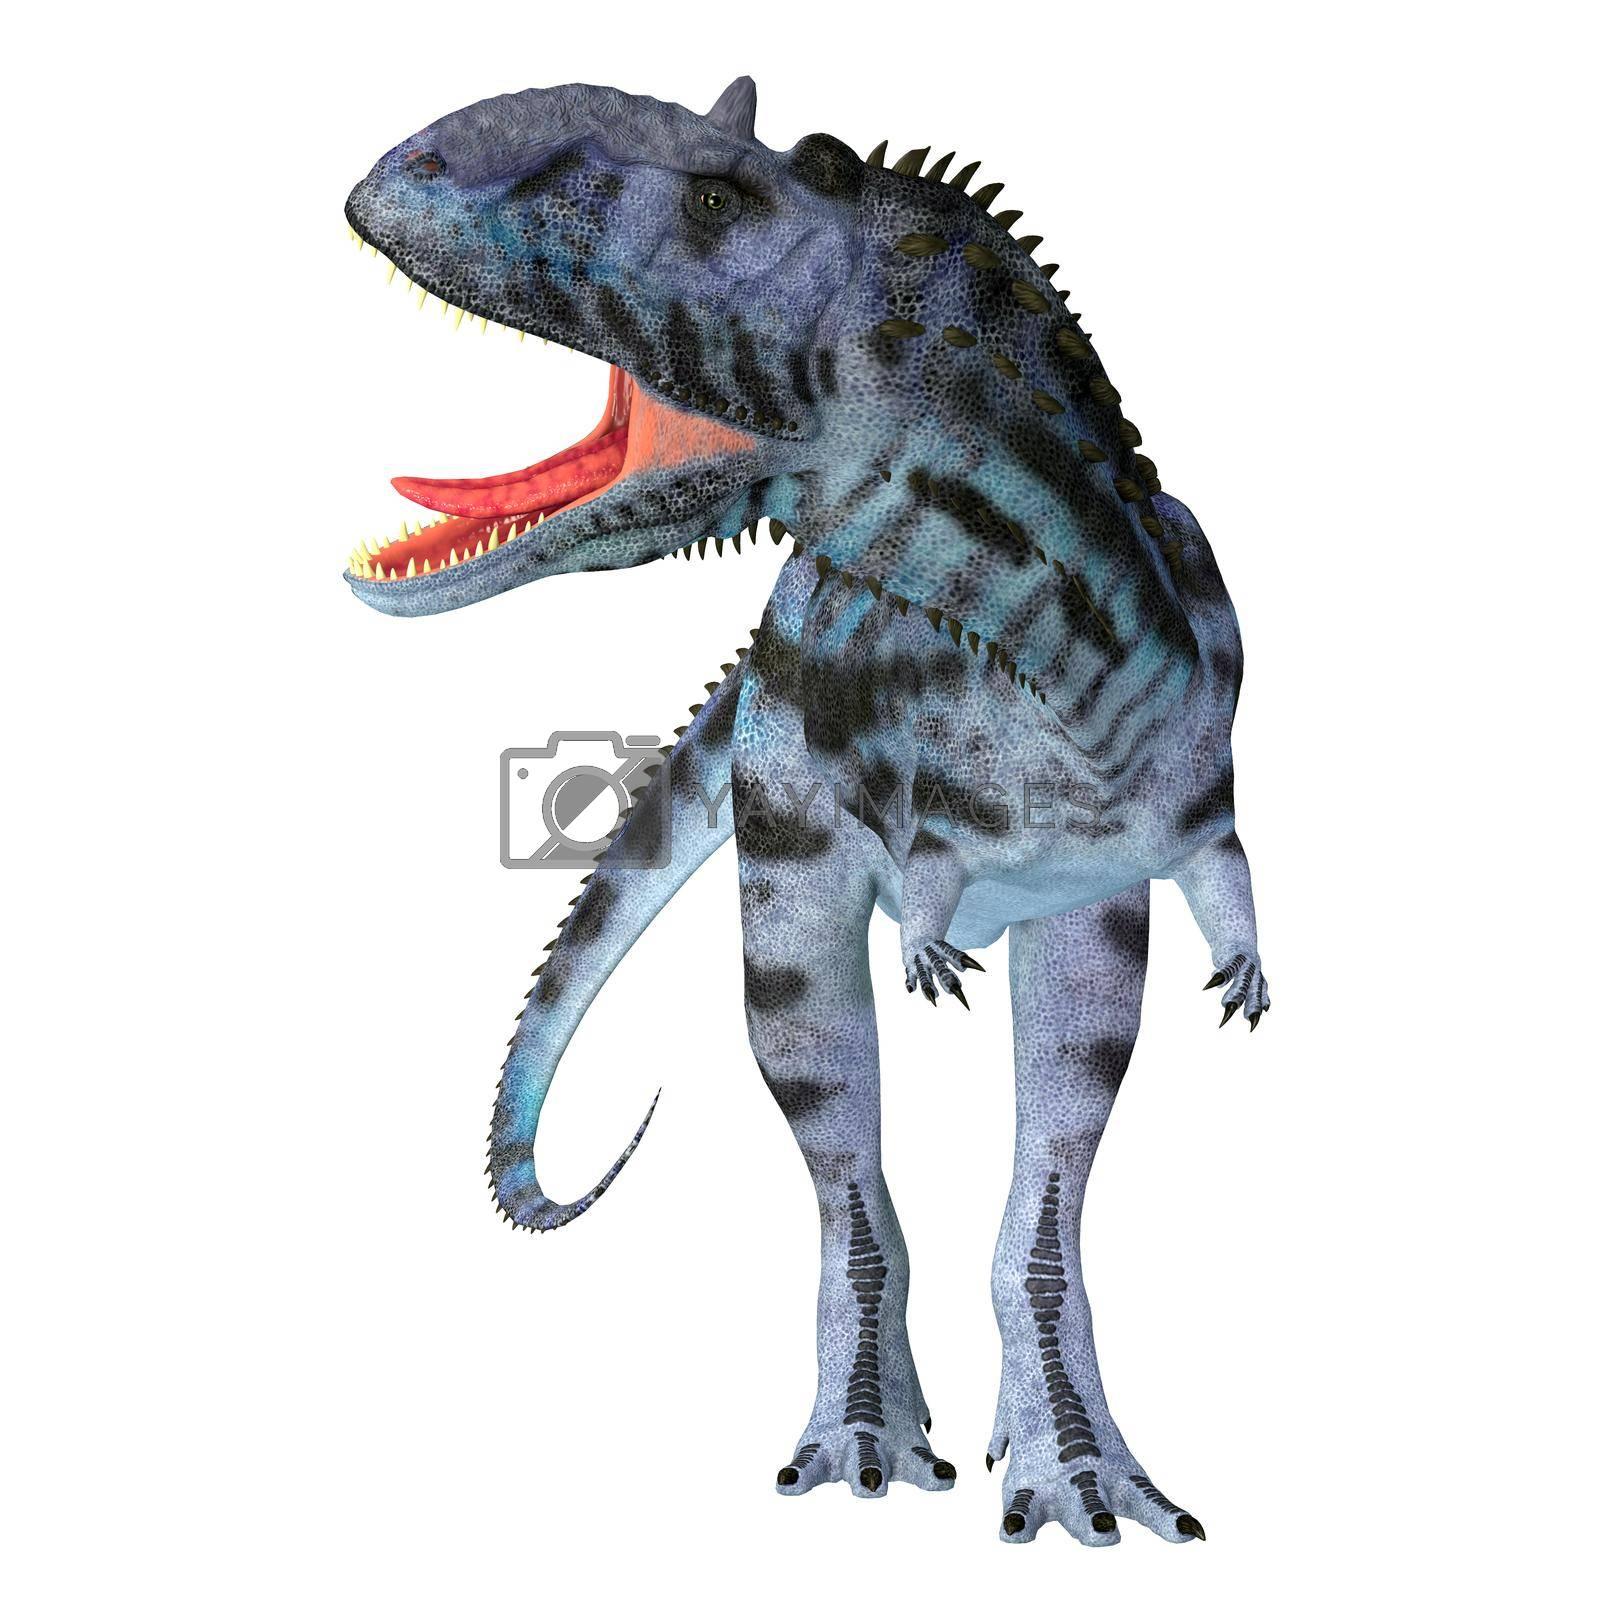 Royalty free image of Majungasaurus Dinosaur on White by Catmando